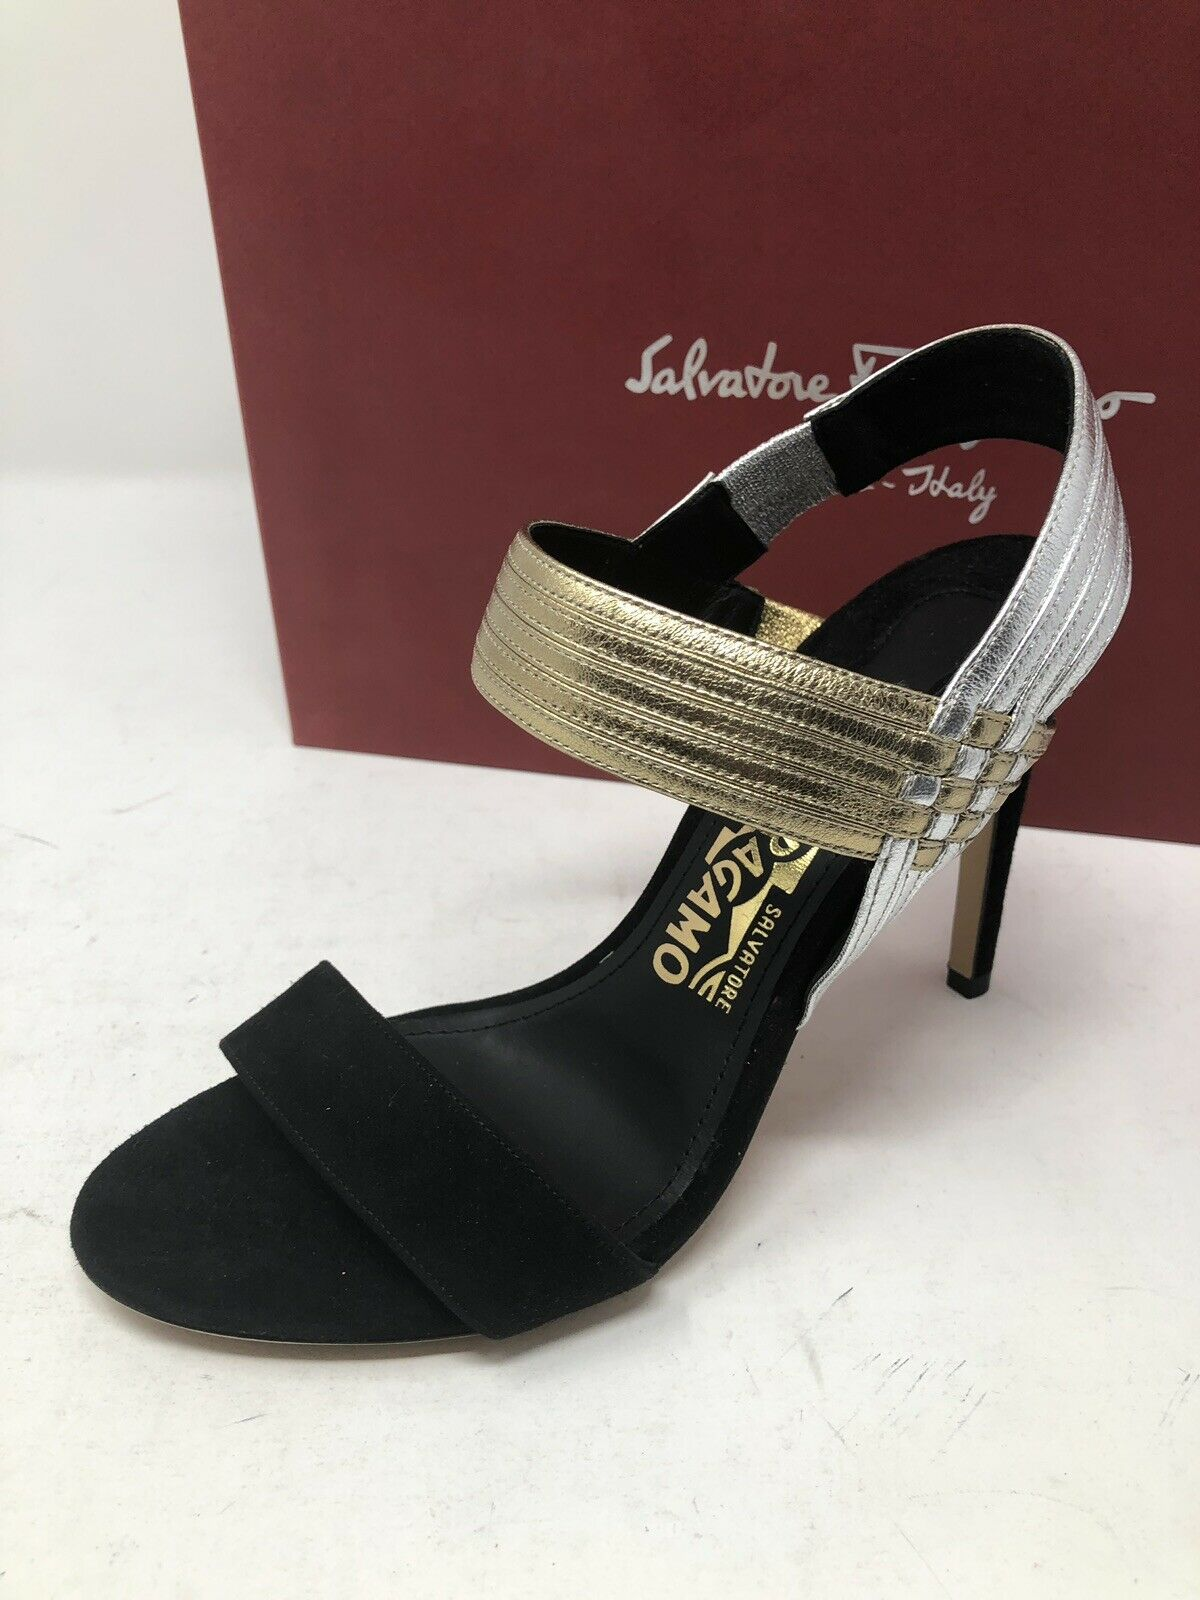 850 New Salvatore Ferragamo Womens Black shoes Ladies Sandals Heels Size 6 36